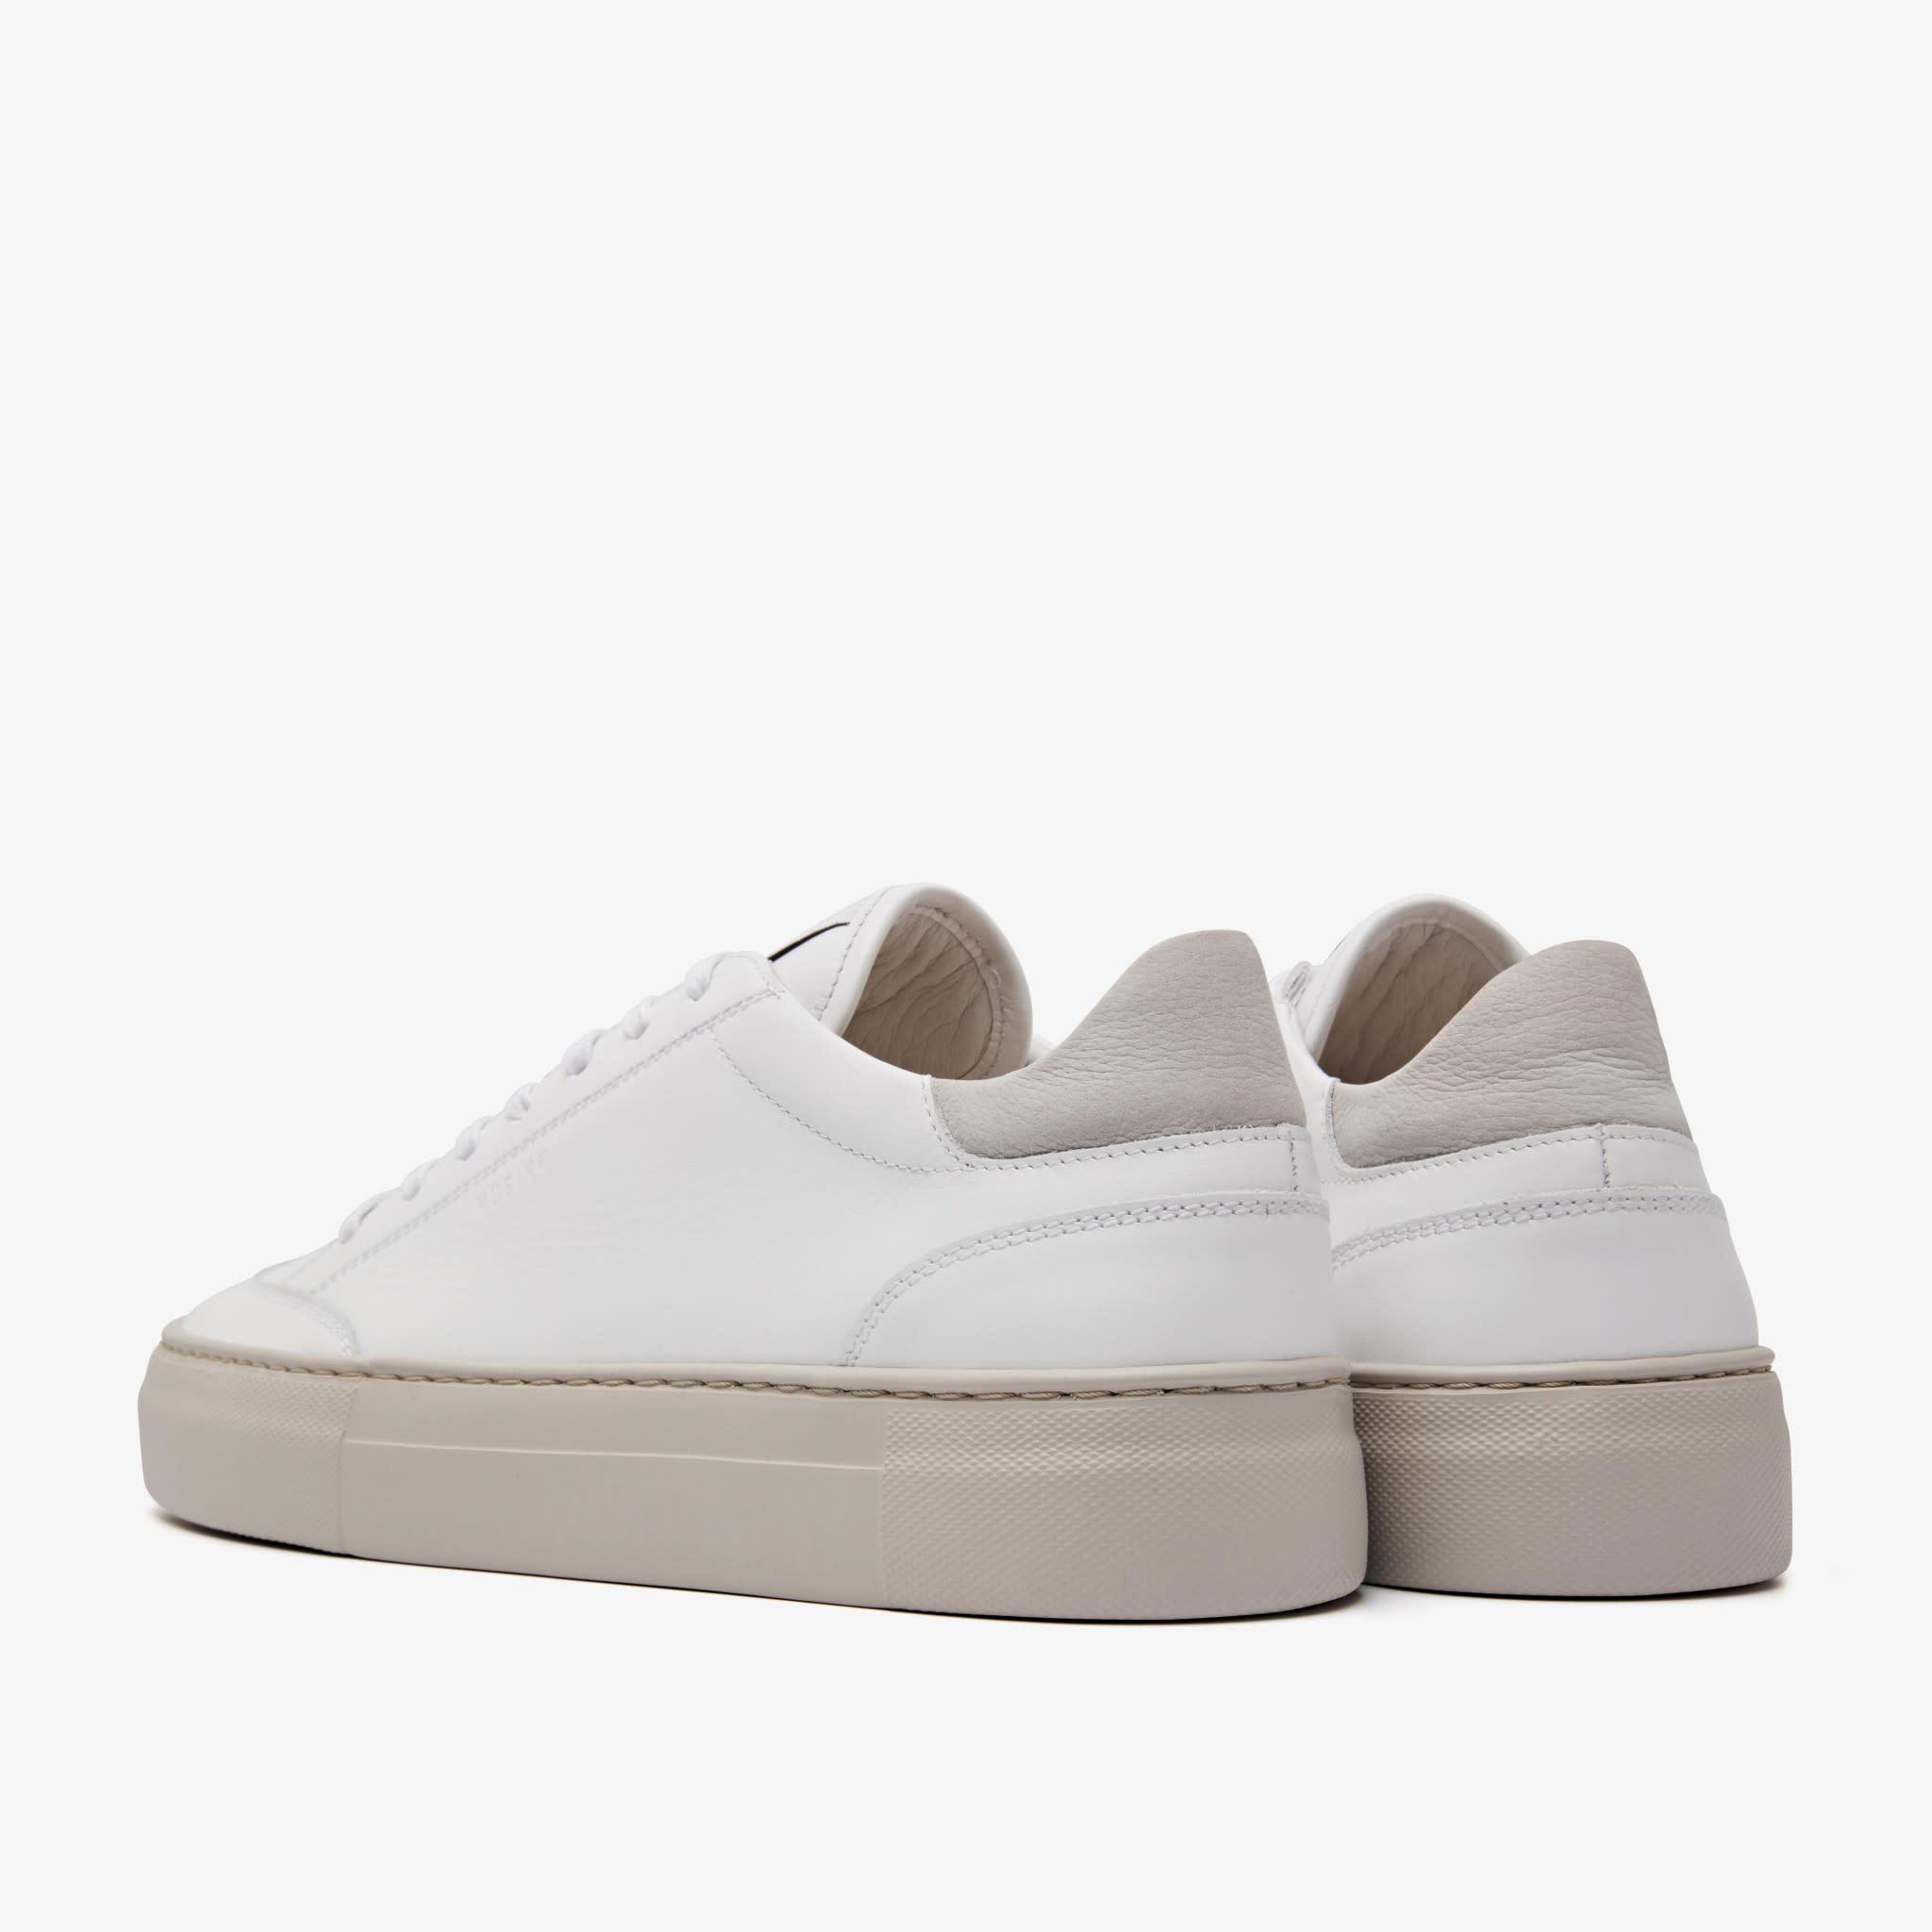 Jagger Tora white Leather Multicolor-6